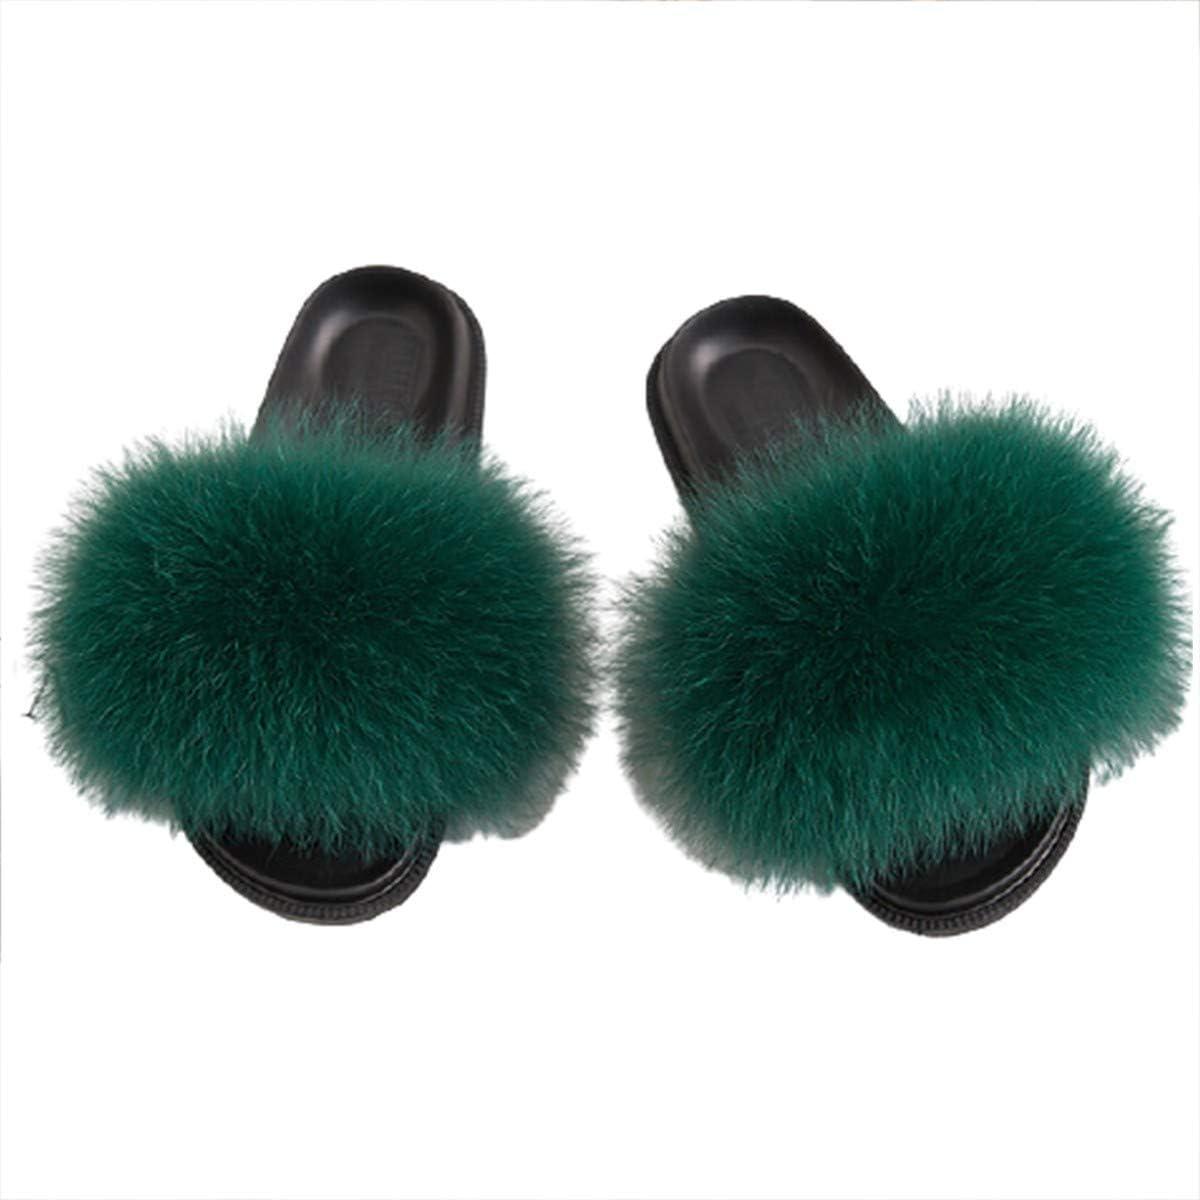 Zapatillas para Mujer de Suaves Pelo Sintético Chinelas Mujer Verano Punta Abierta Peludo Acogedor Pantuflas Antideslizante Slippers #9-44/45 EU